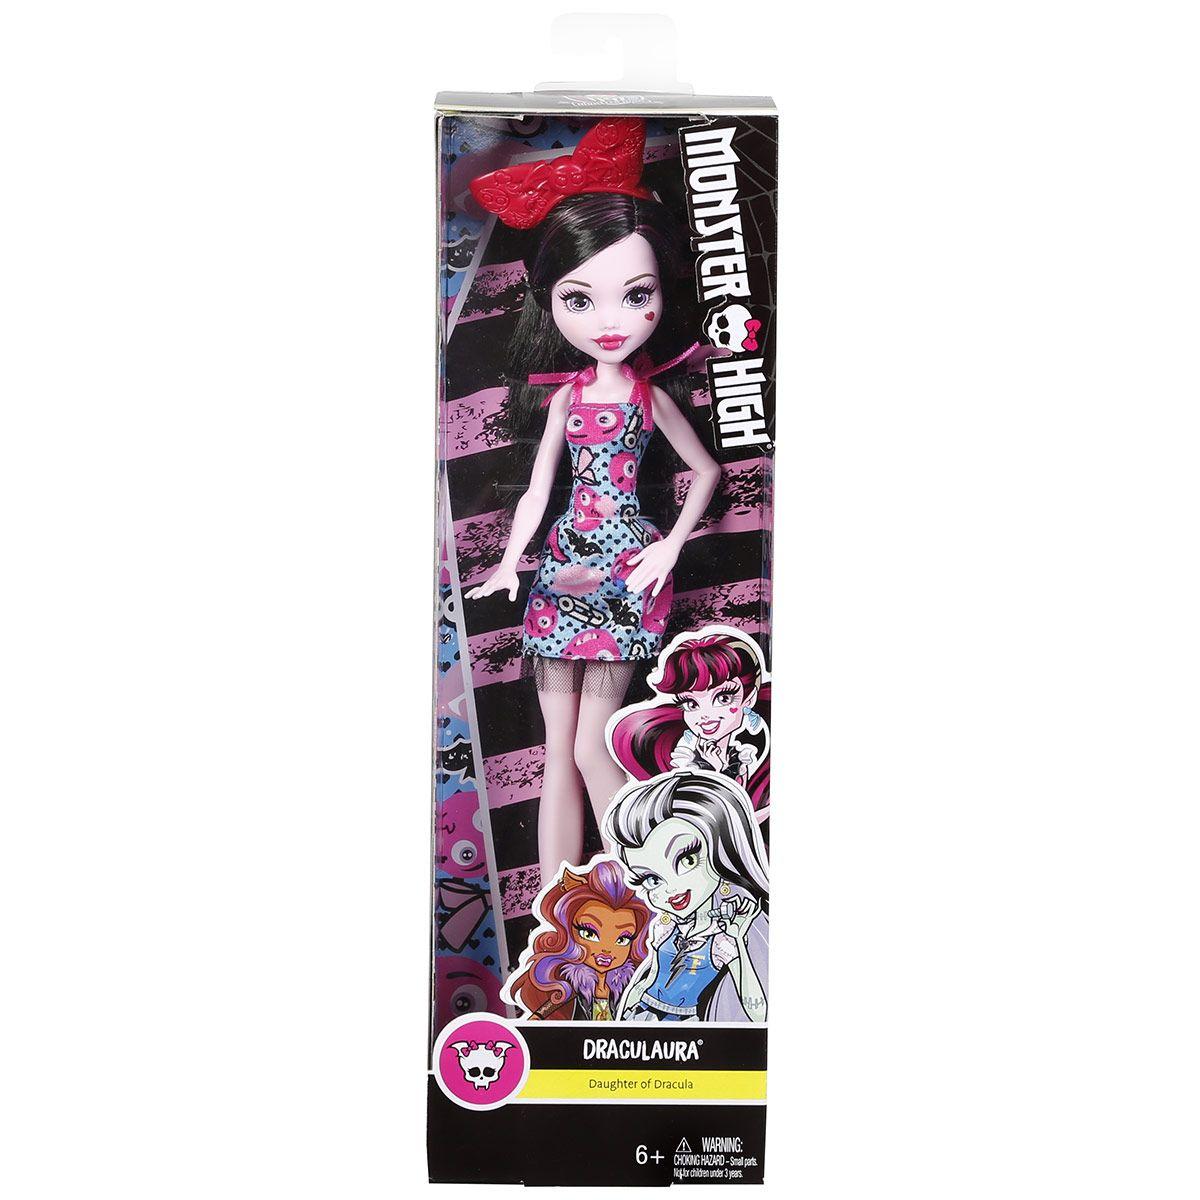 Poupee Monster High Goule Draculaura Vehicules Et Figurines La Grande Recre